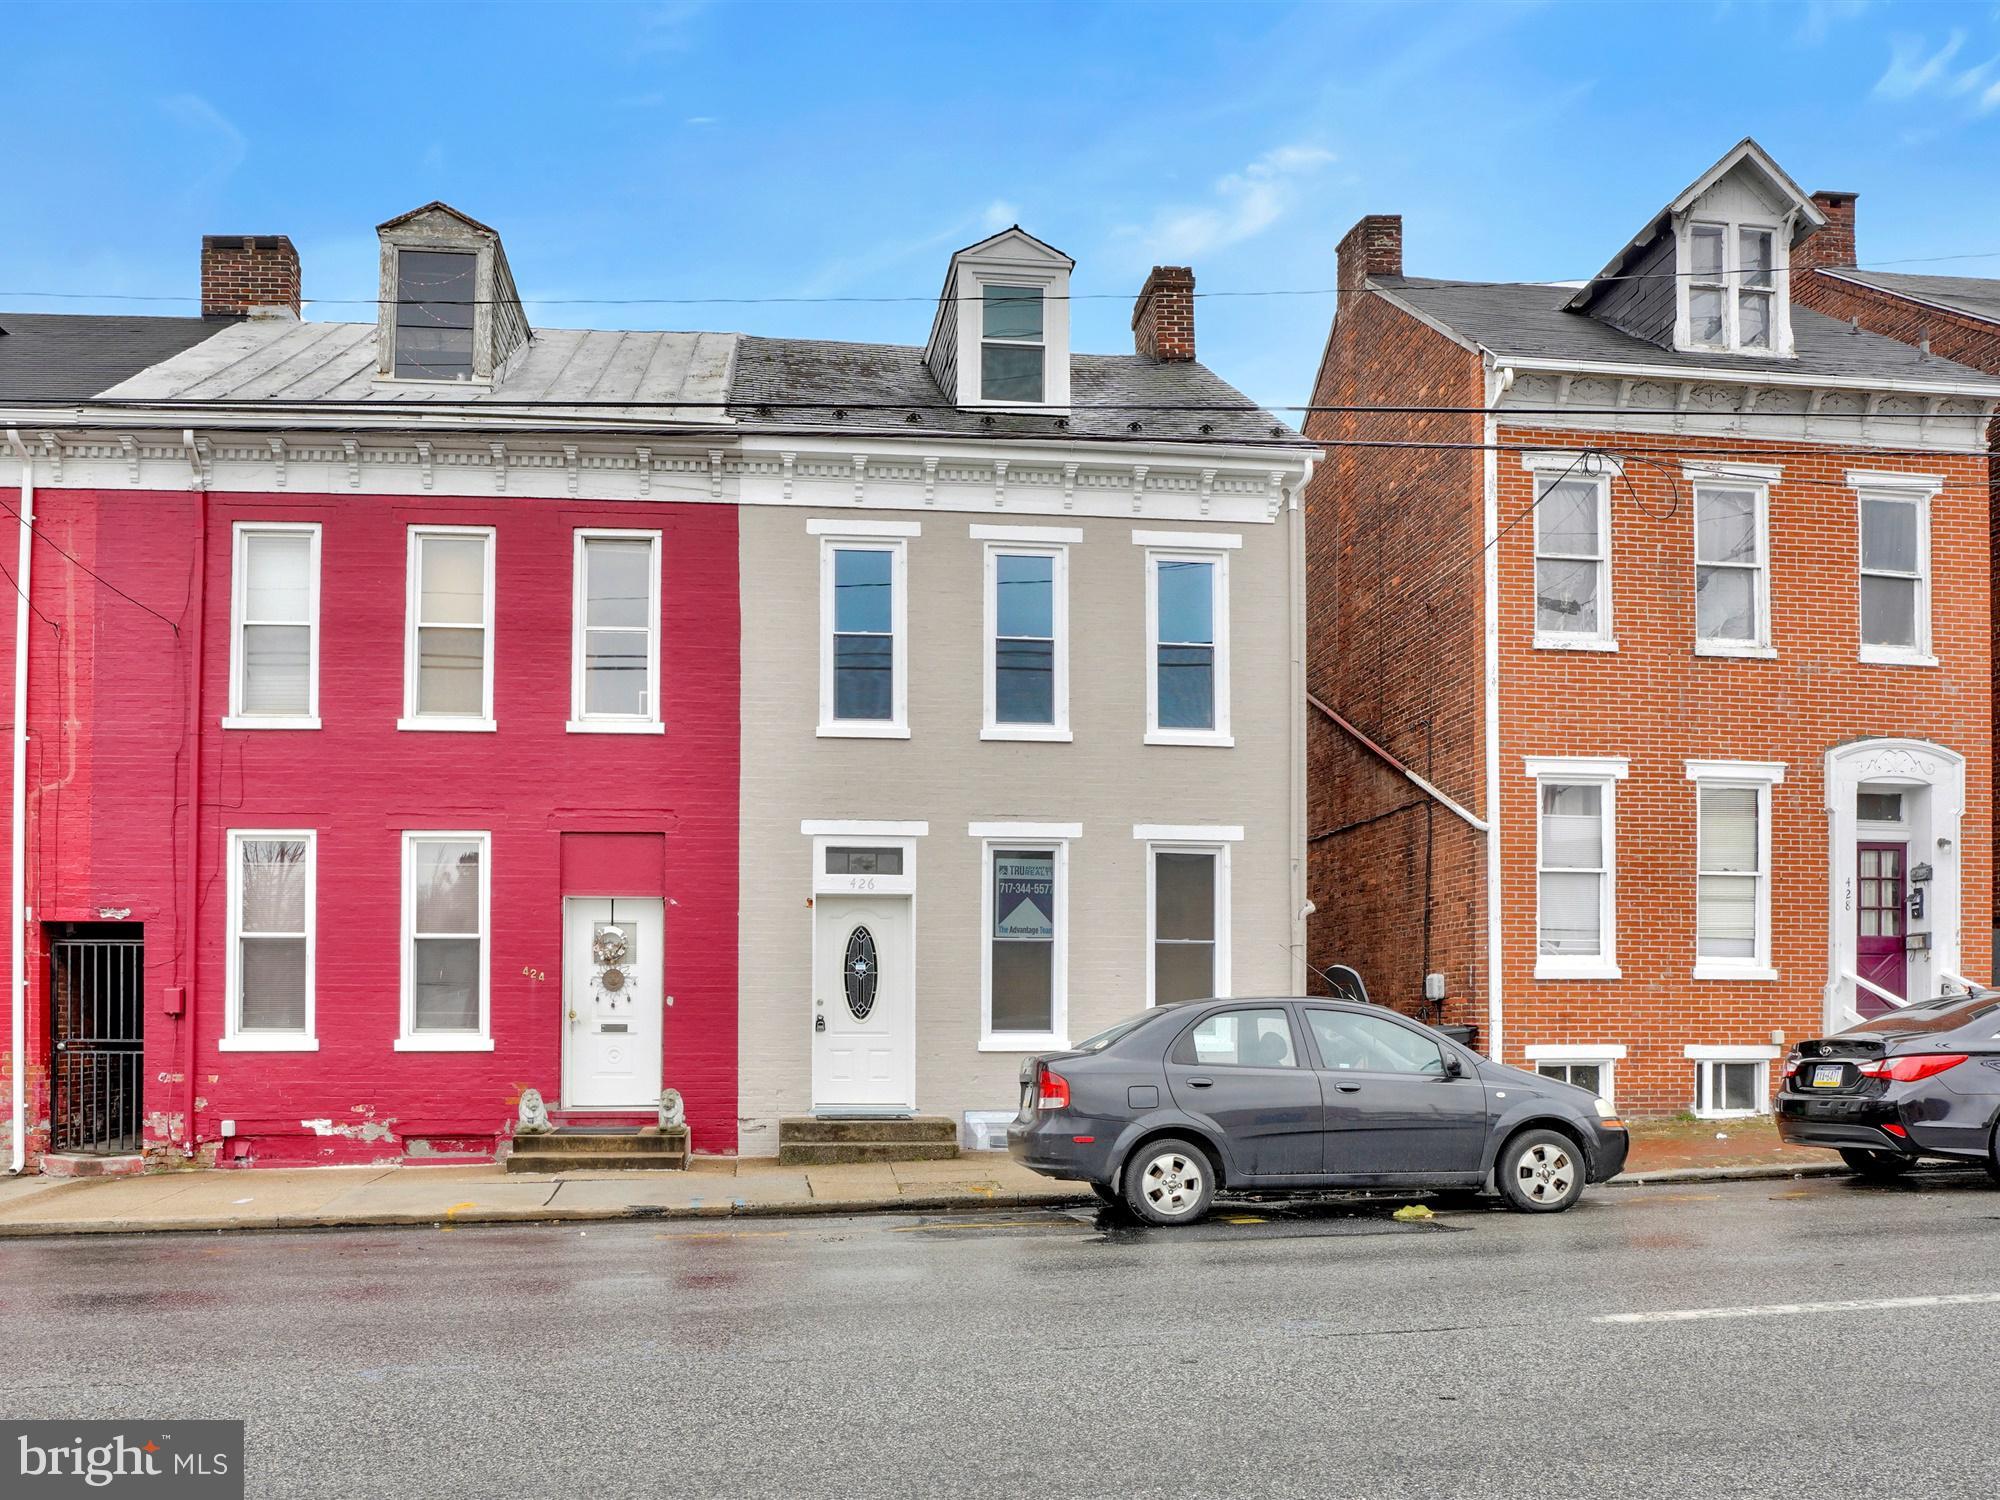 426 W Philadelphia Street, York, PA 17401